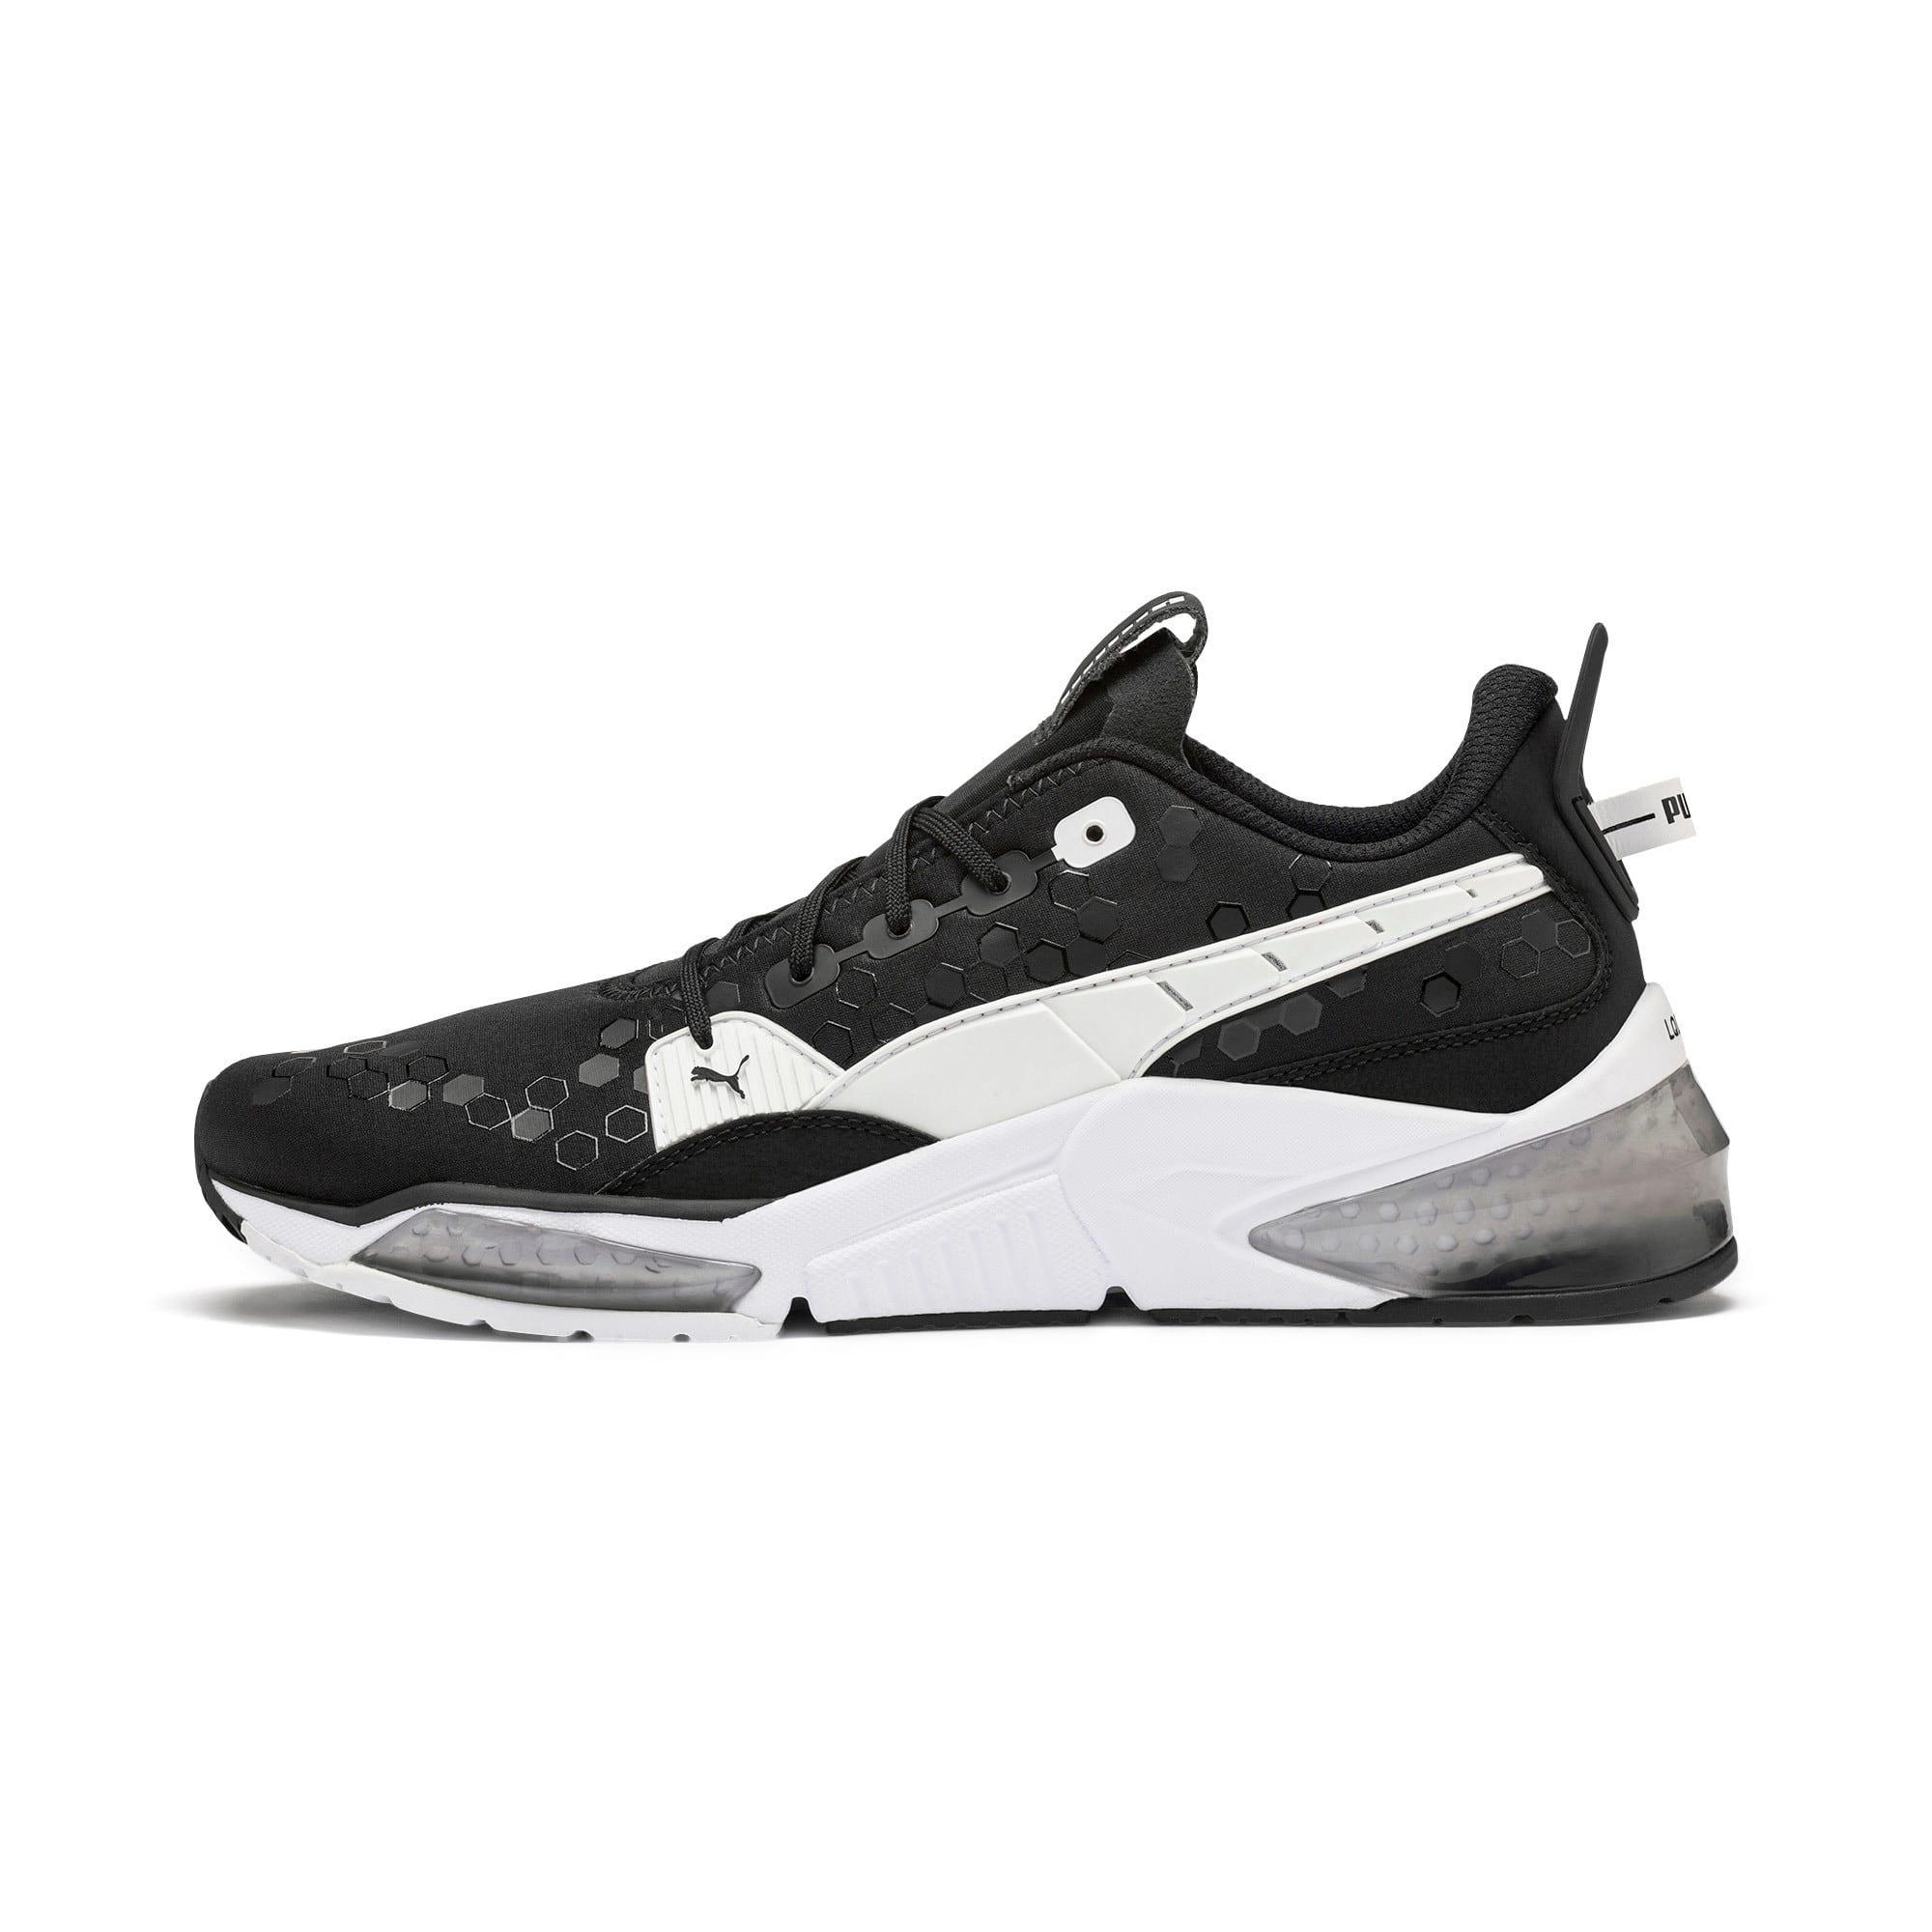 Thumbnail 1 of LQDCELL Optic Training Shoes, Puma Black-Puma White, medium